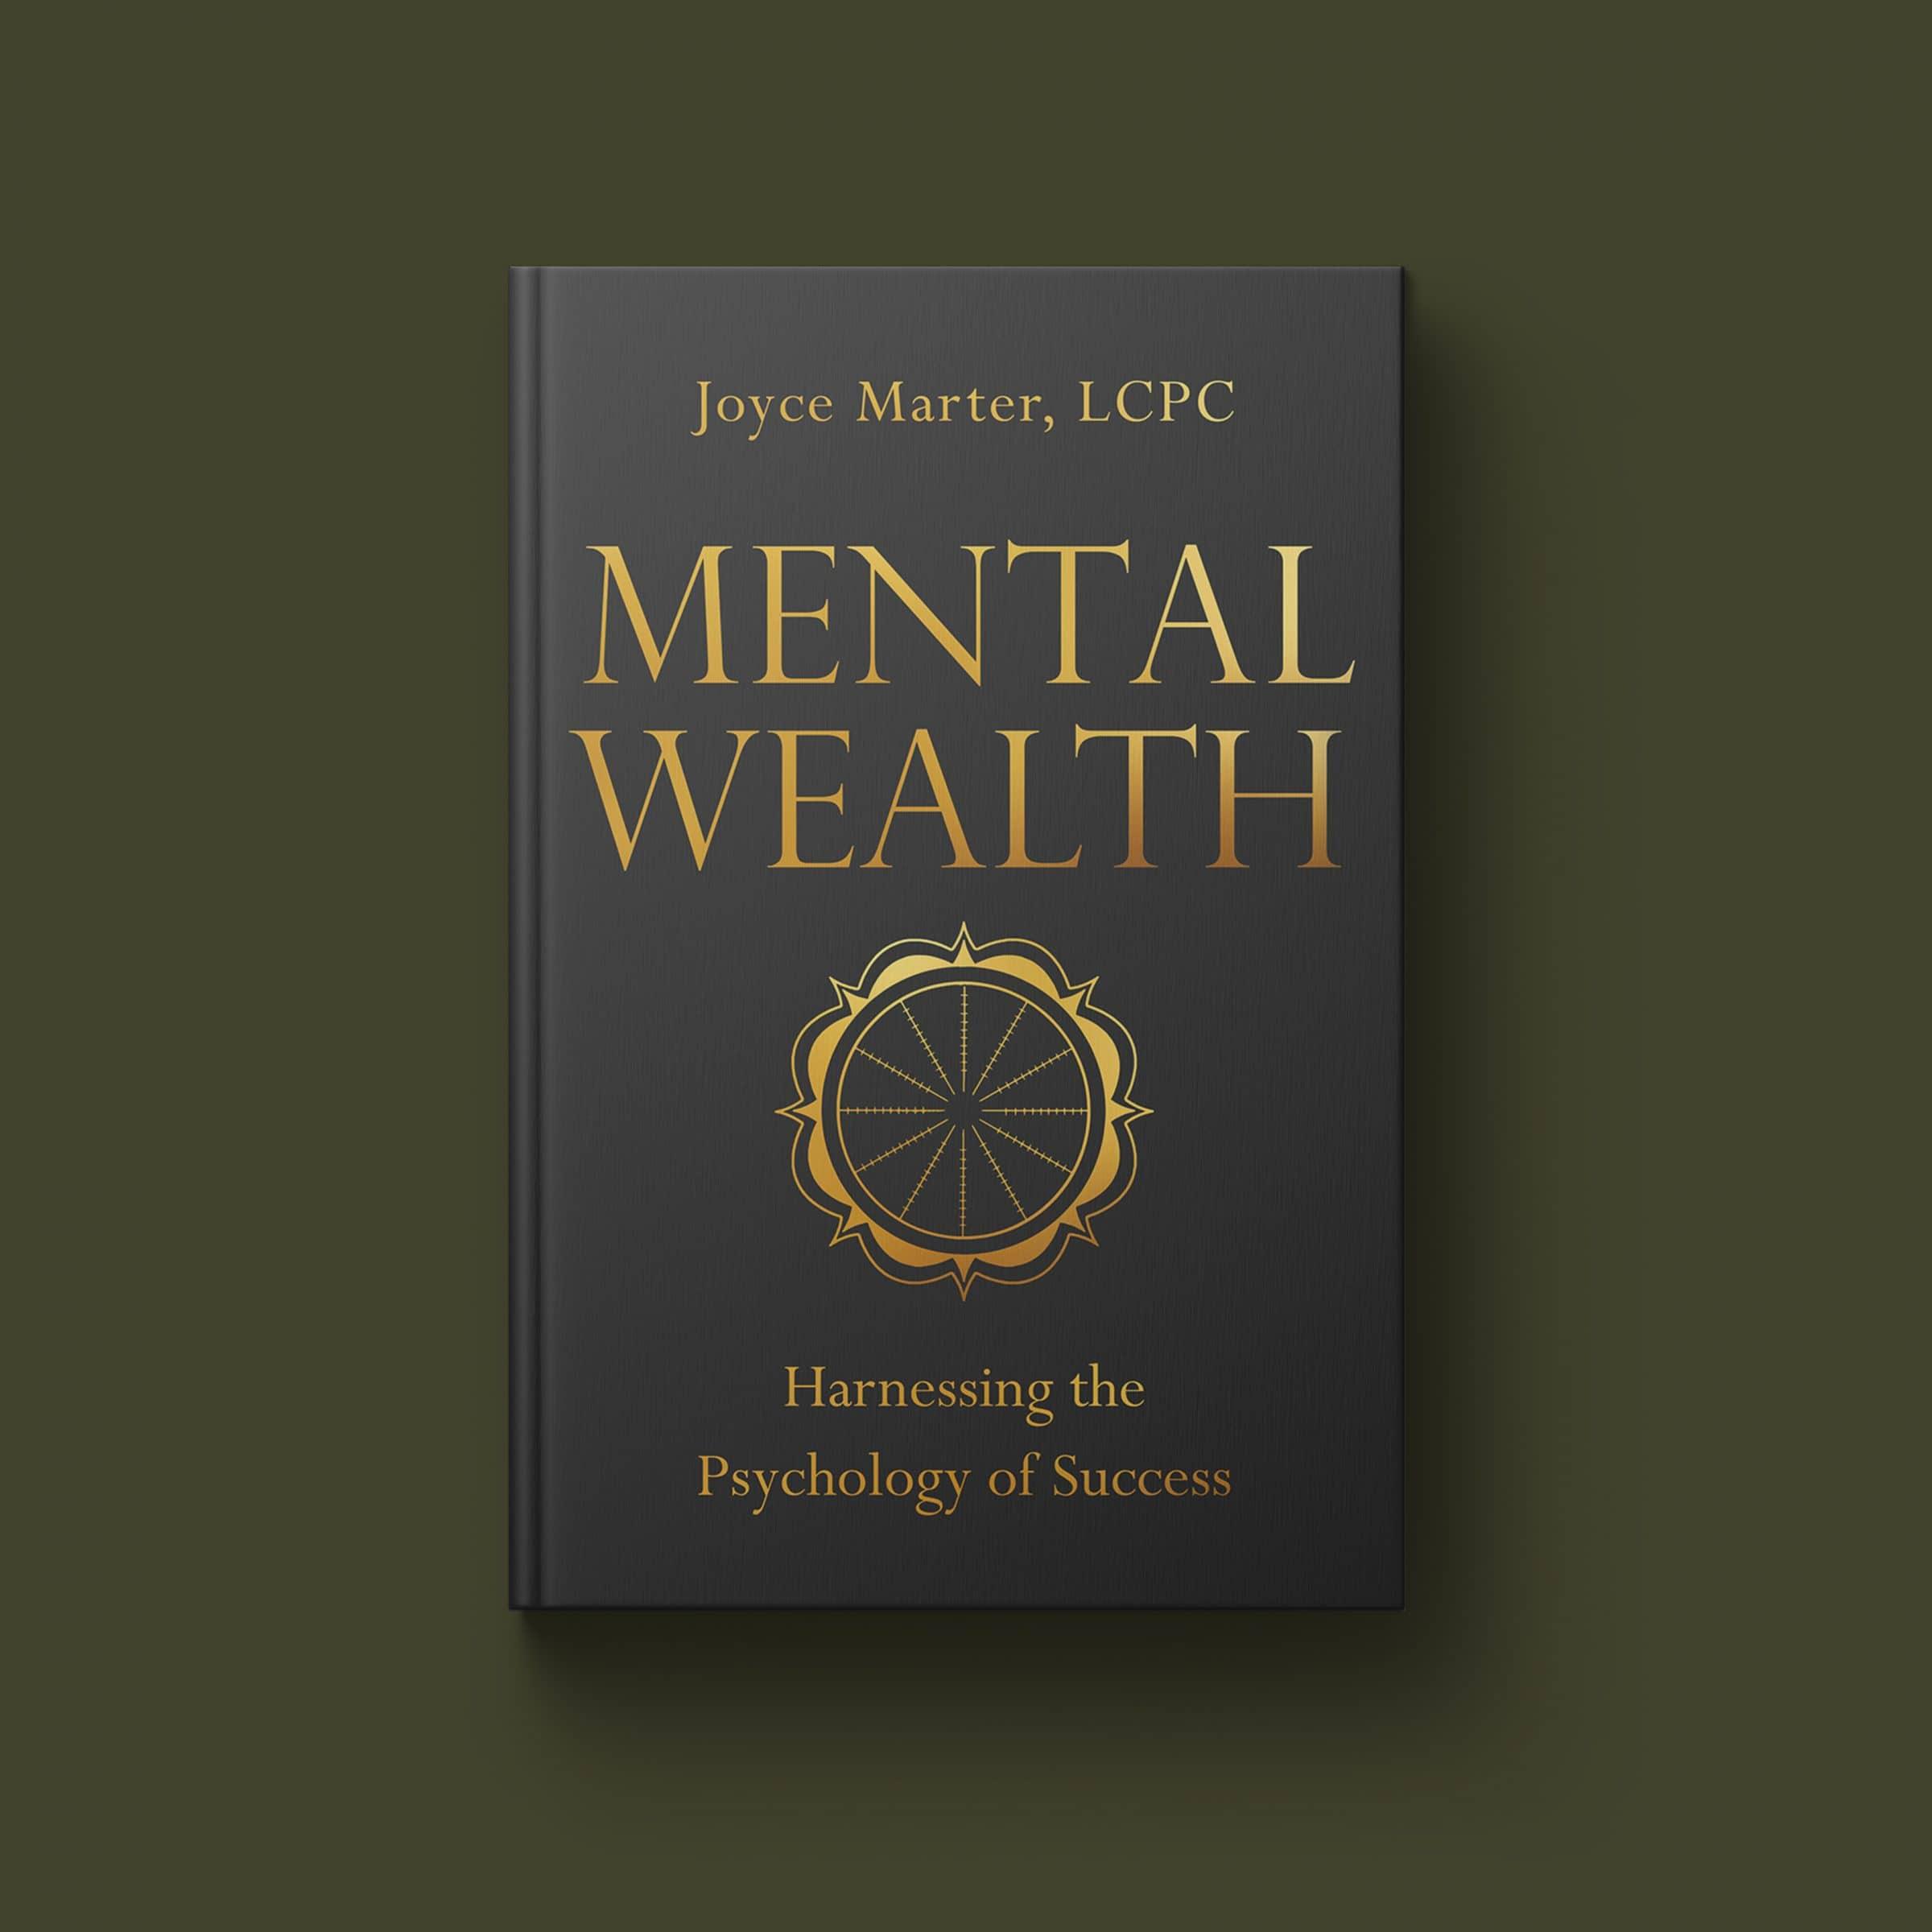 mental-wealth-joyce-marter-cover-art-5